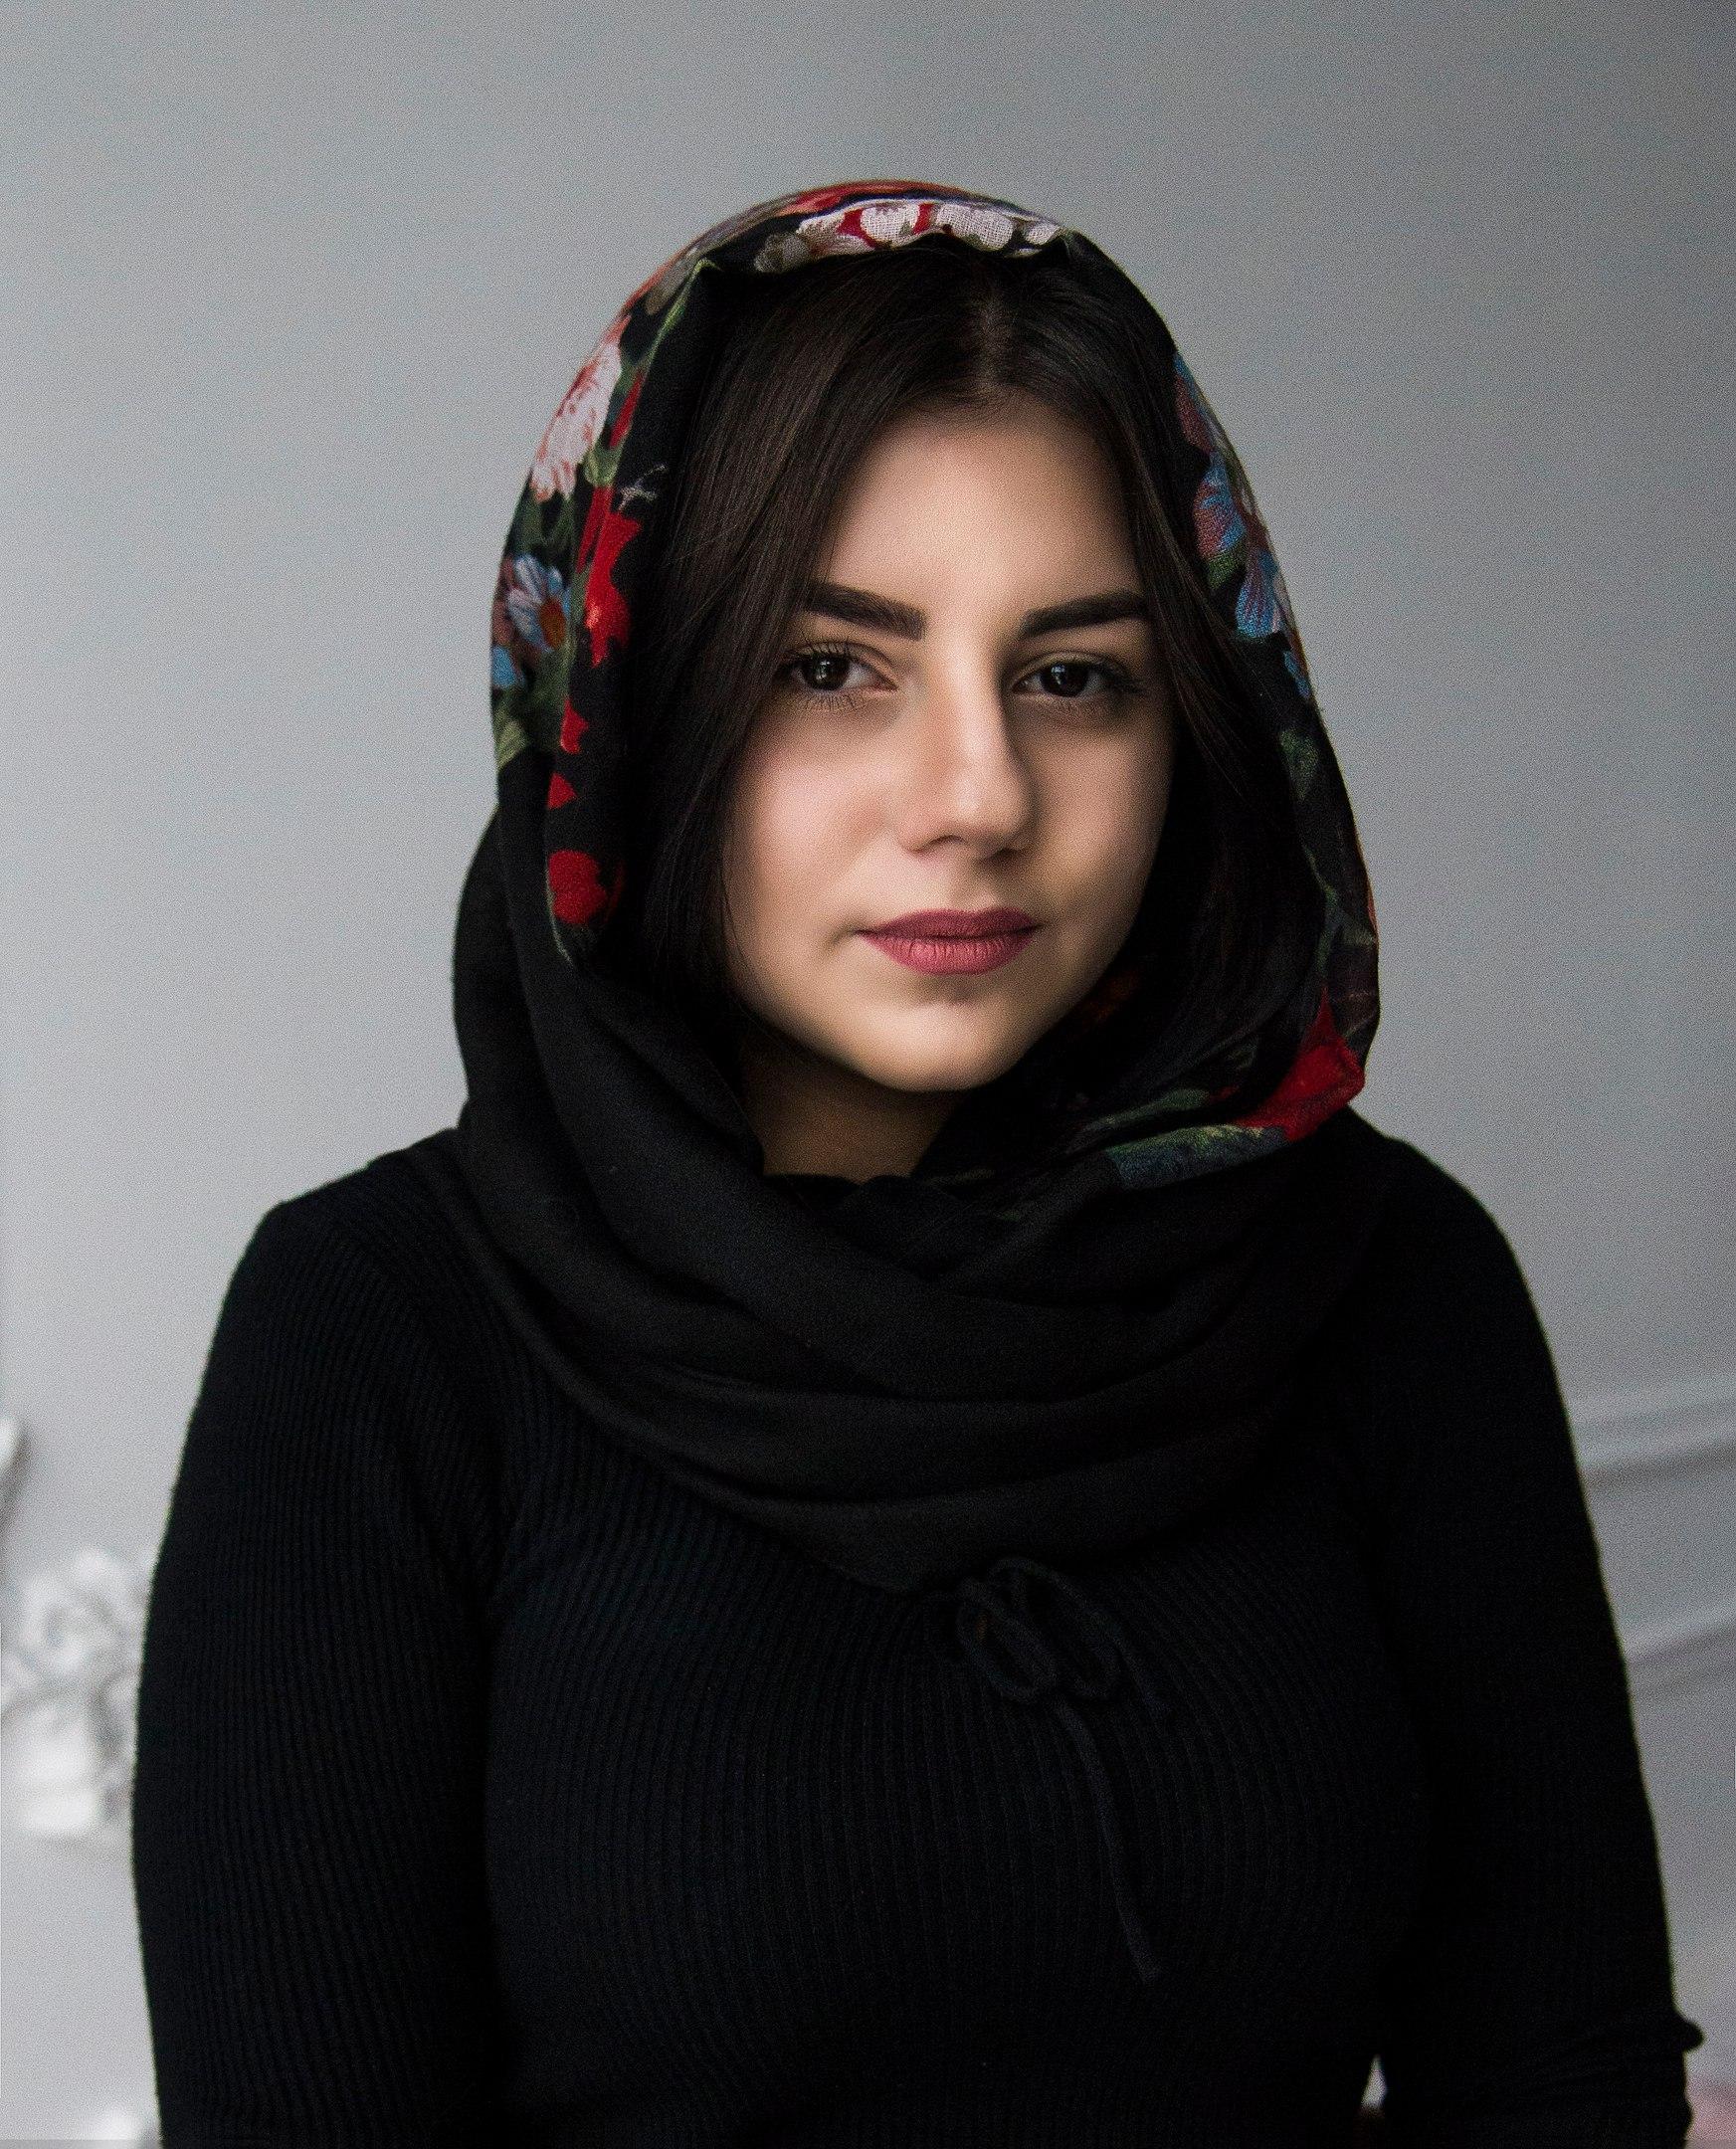 Красиво девушка чеченки